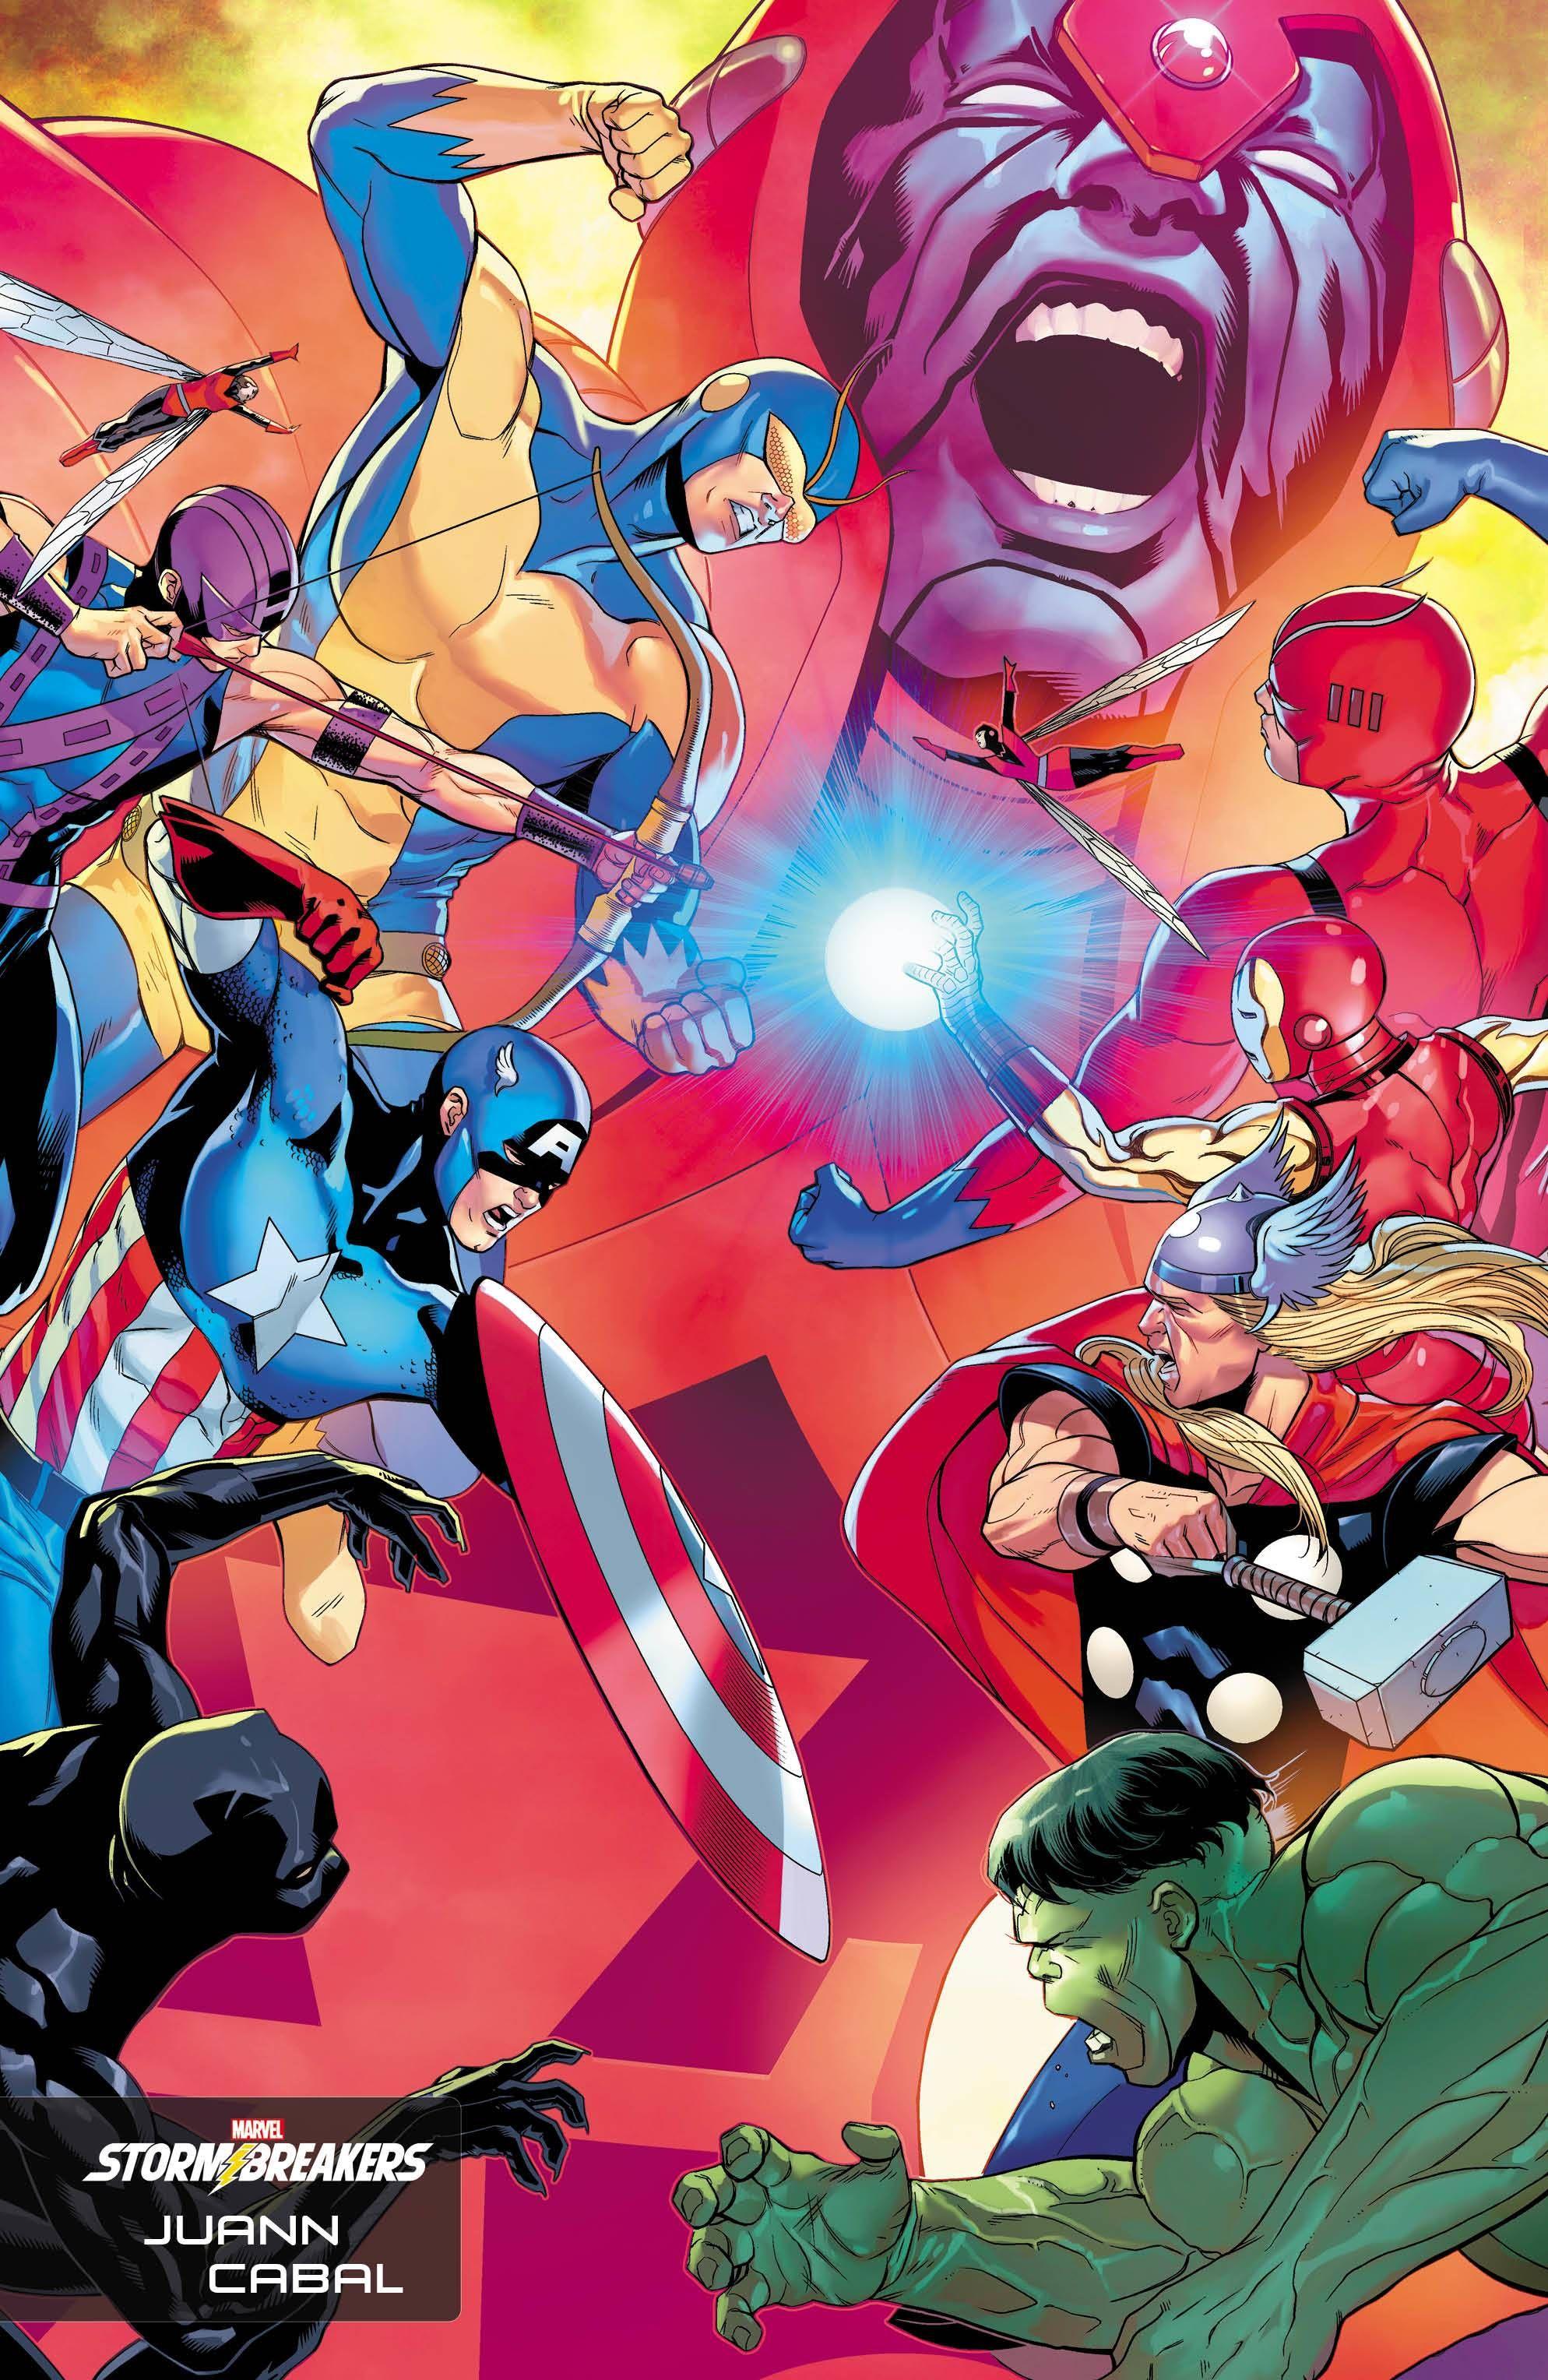 eyJidWNrZXQiOiJnb2NvbGxlY3QuaW1hZ2VzLnB1YiIsImtleSI6IjJkZWQxM2QxLWViZWYtNDBiYy04NDM0LTExY2MwMDlhNTZmYS5qcGciLCJlZGl0cyI6W119 ComicList: Marvel Comics New Releases for 08/18/2021